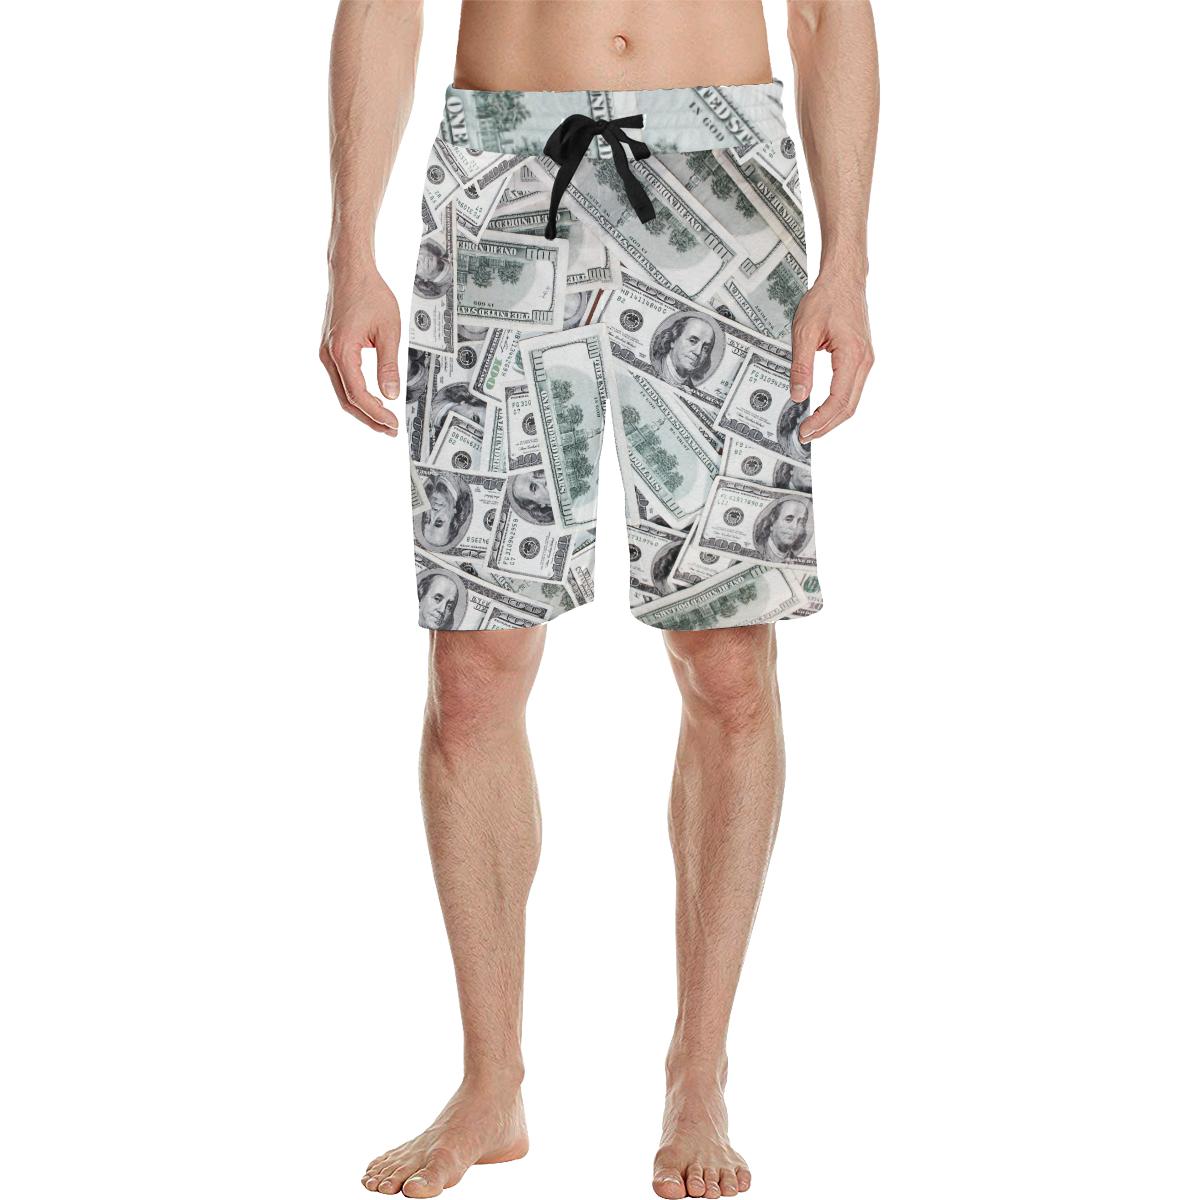 002726560c Cash Money / Hundred Dollar Bills Men's All Over Print Casual Shorts by  #Gravityx9 at #Artsadd * mens swimshorts * swimming trunks * swimming  shorts ...